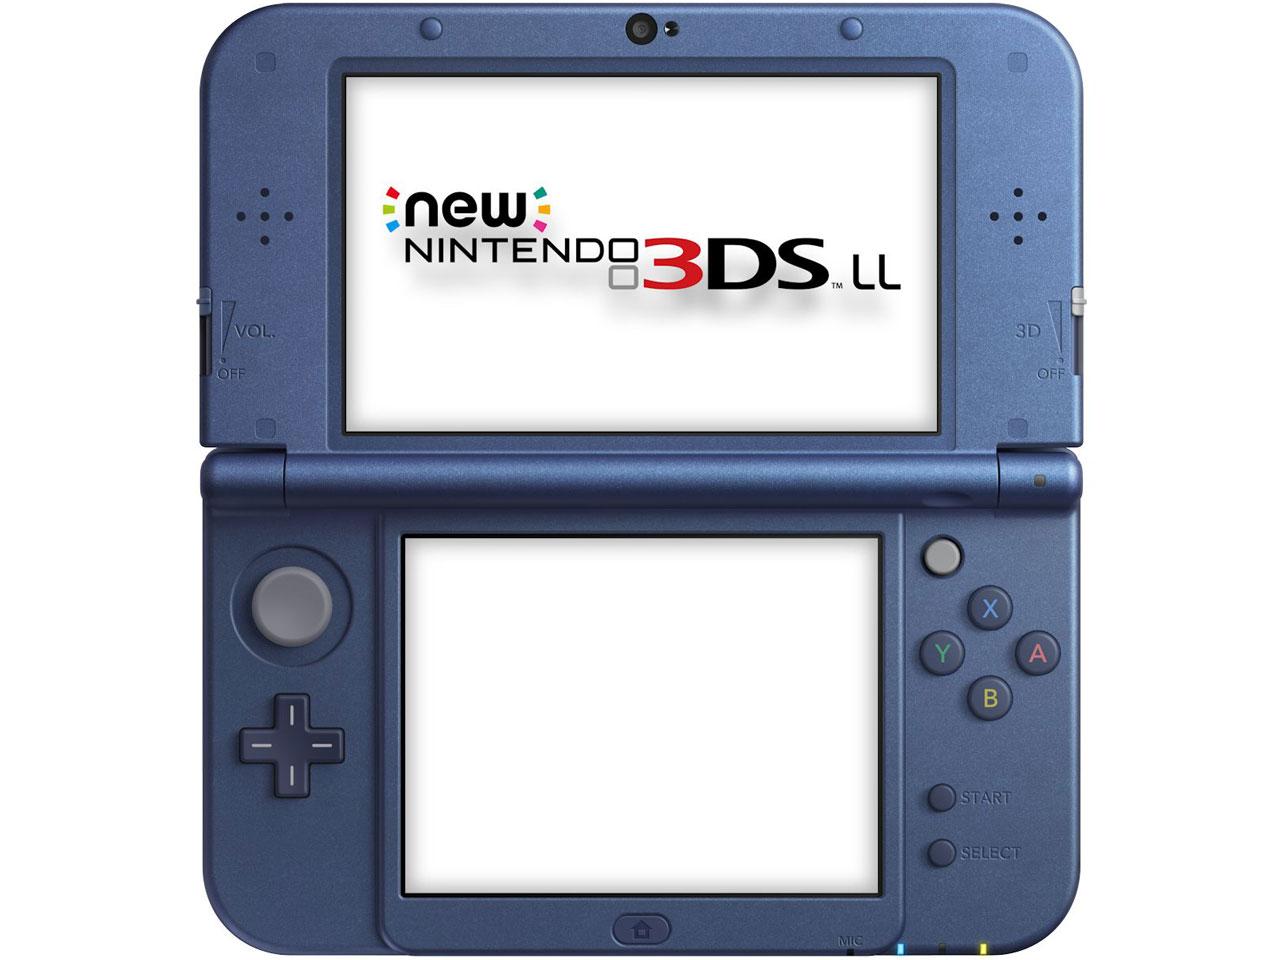 �w�{��1�x New�j���e���h�[3DS LL ���^���b�N�u���[ �̐��i�摜